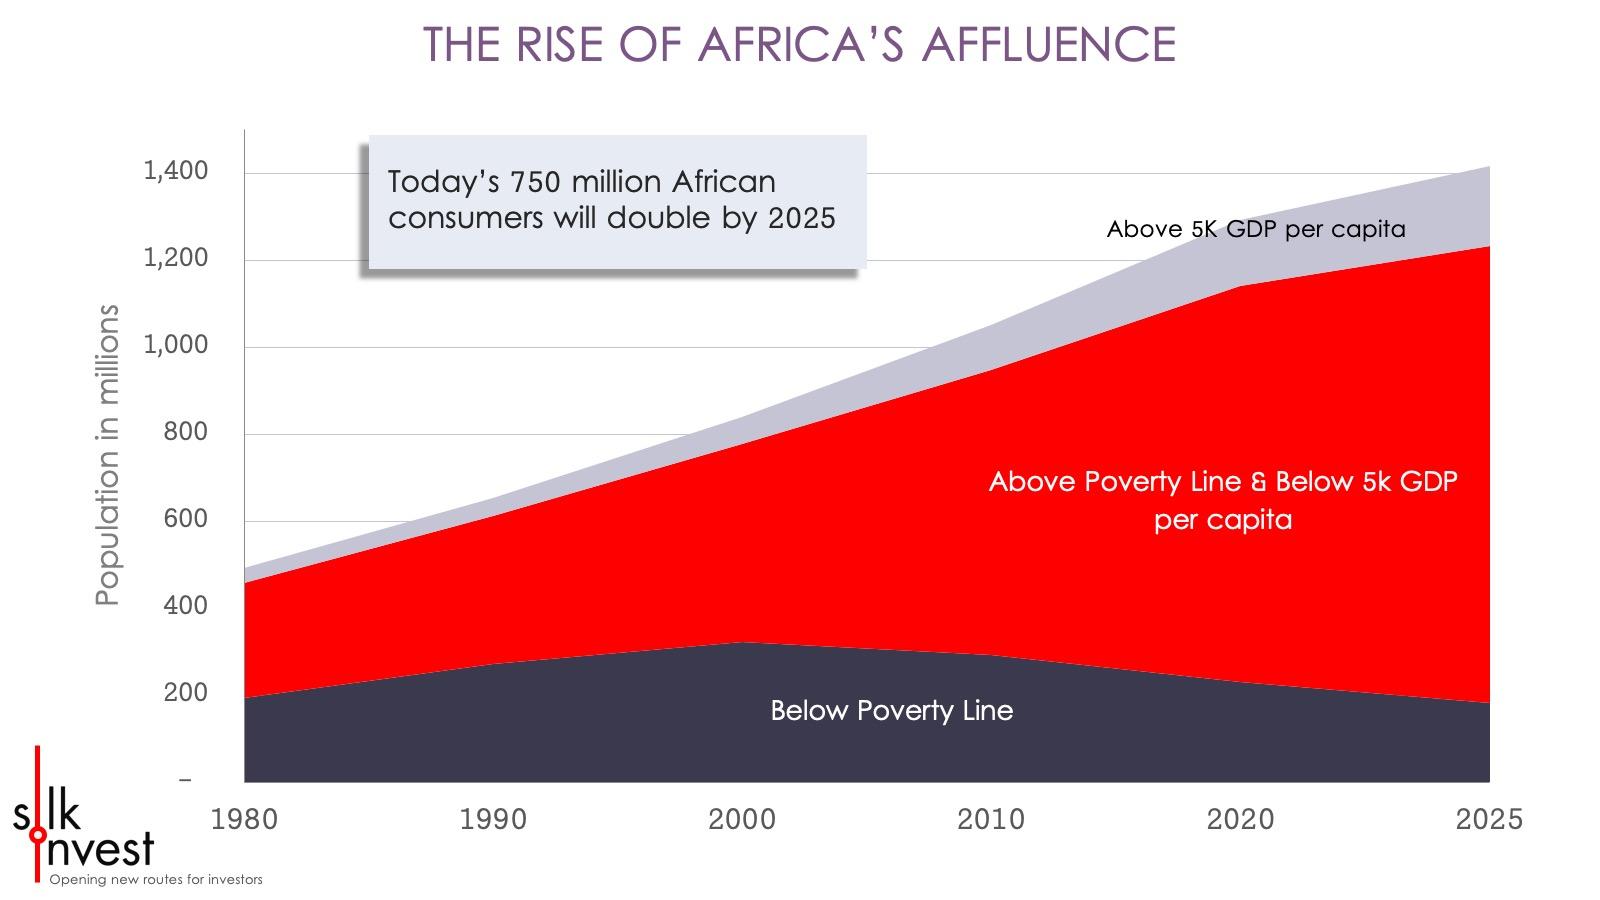 Silk Invest - Africa Smart Charts africa affluence.jpg